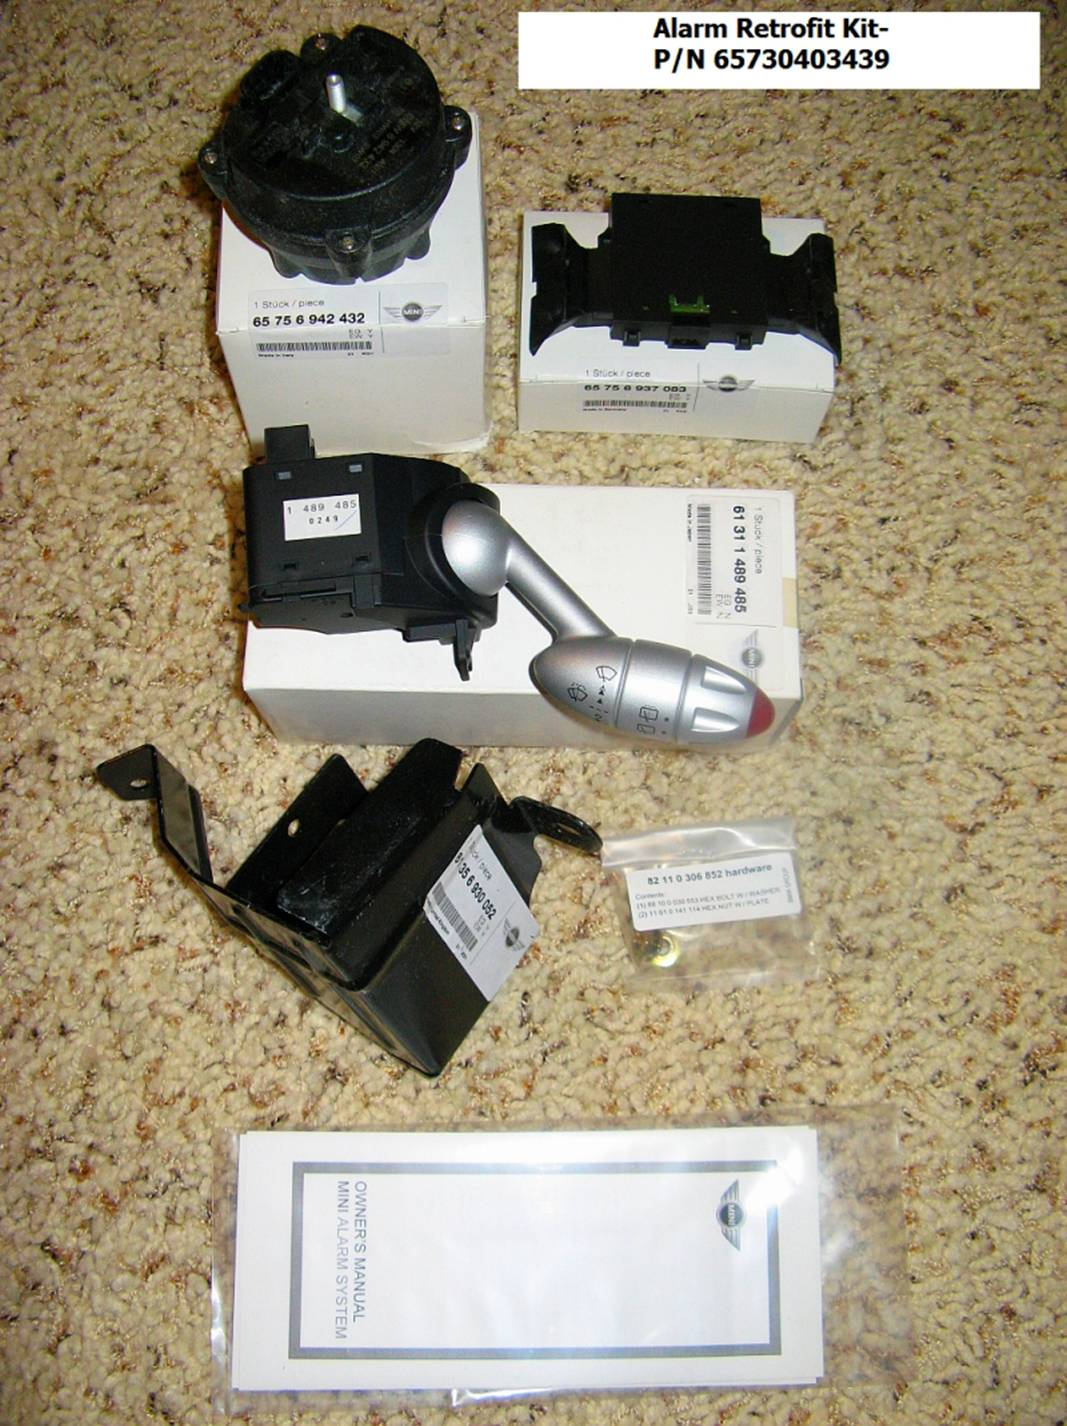 Mini Cooper S R50 53 Installing Oe Alarm Retrofit Kit